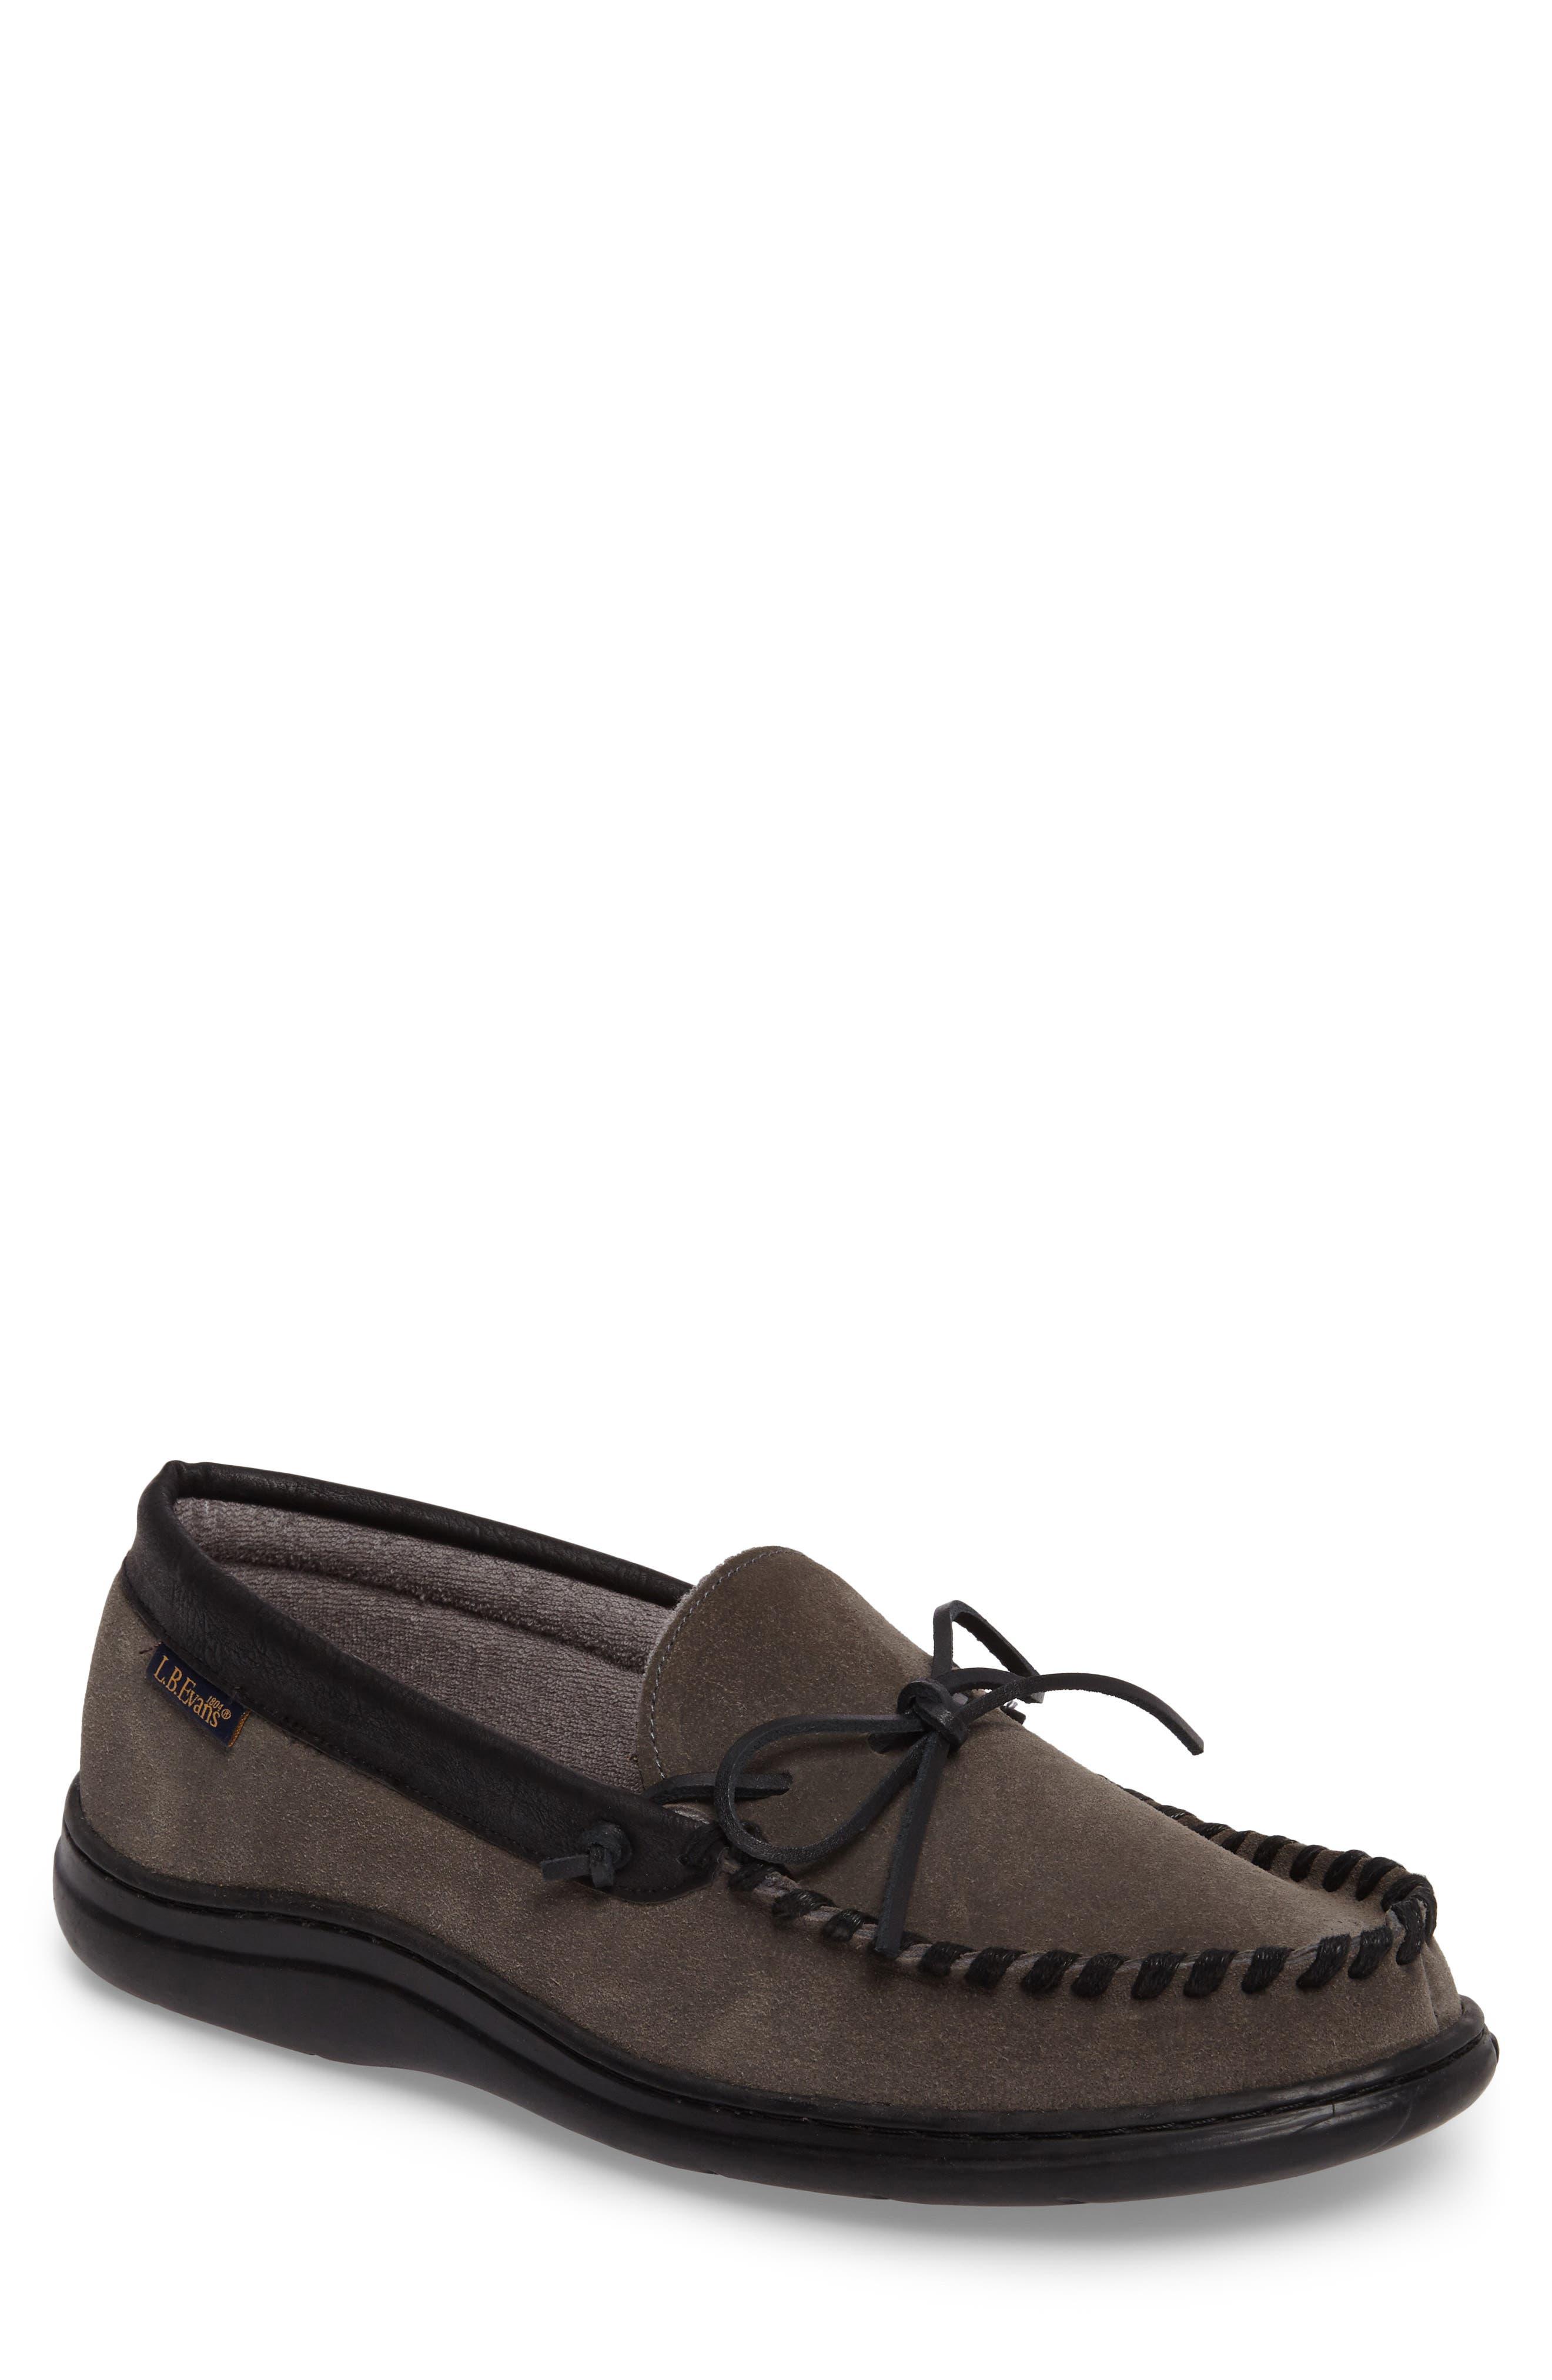 evans shoes online store